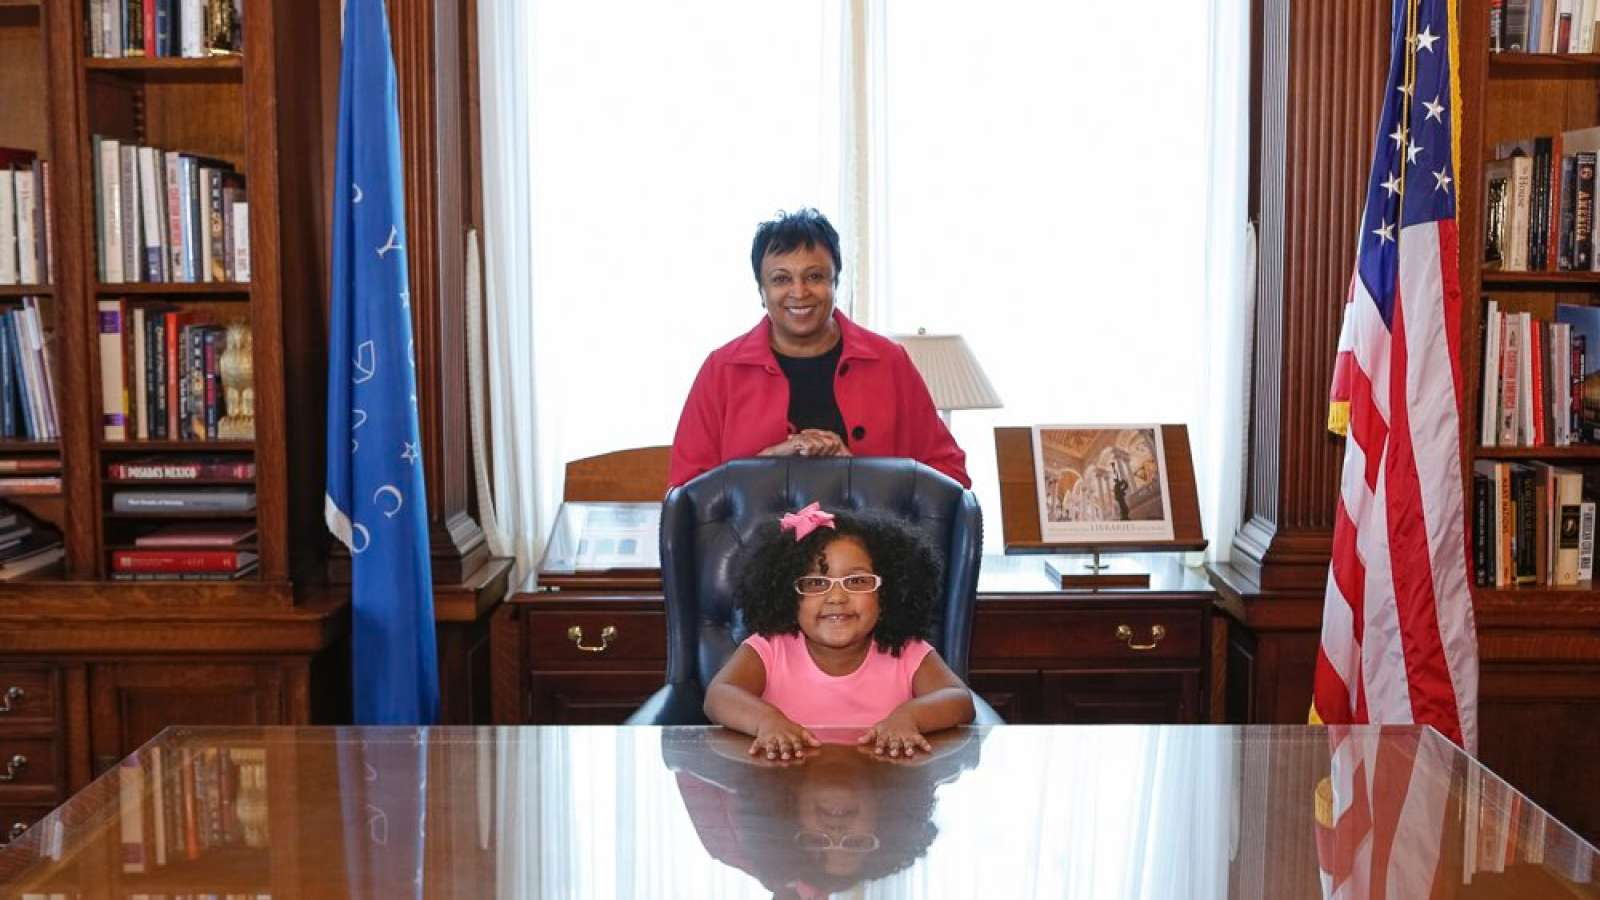 Daliyah Marie Aran, African American Education, Black Education, African American Literacy, African American News, KOLUMN Magazine, KOLUMN